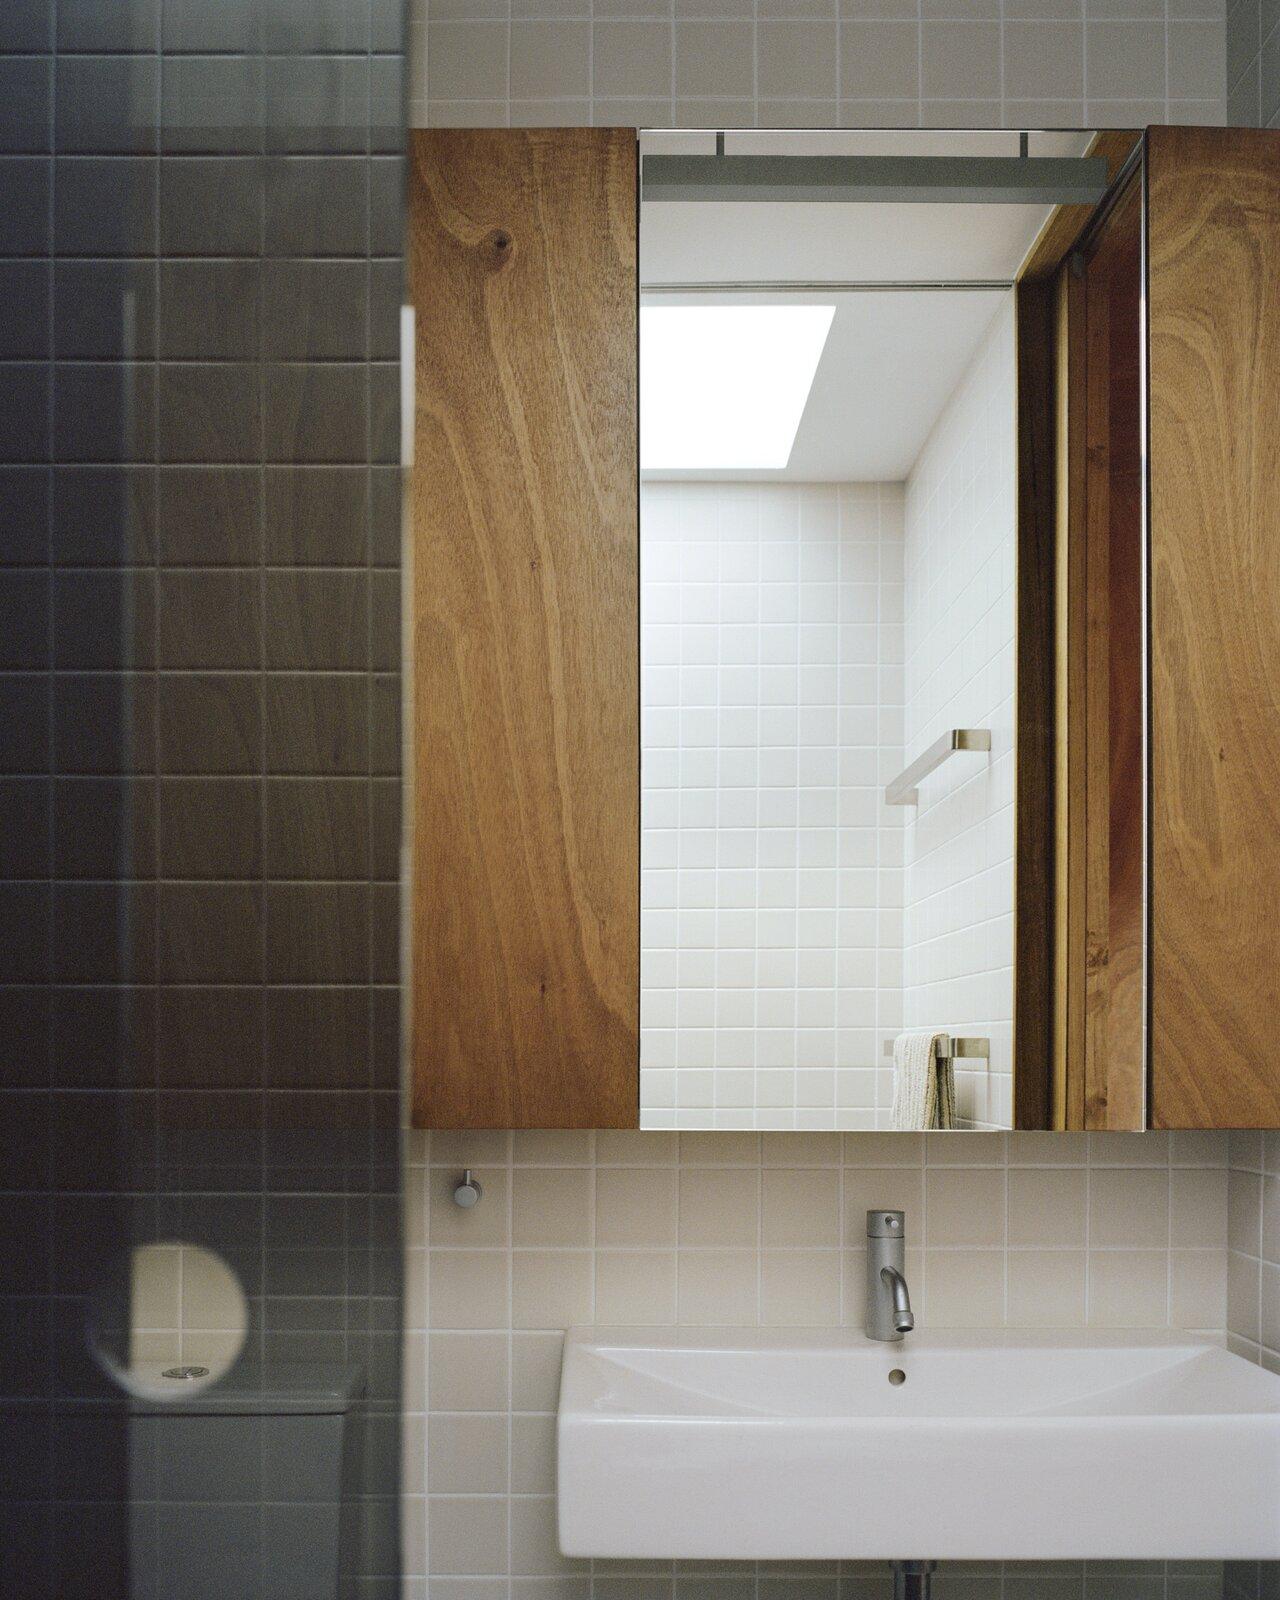 Bathroom of Terrace House 1 by Dreamer